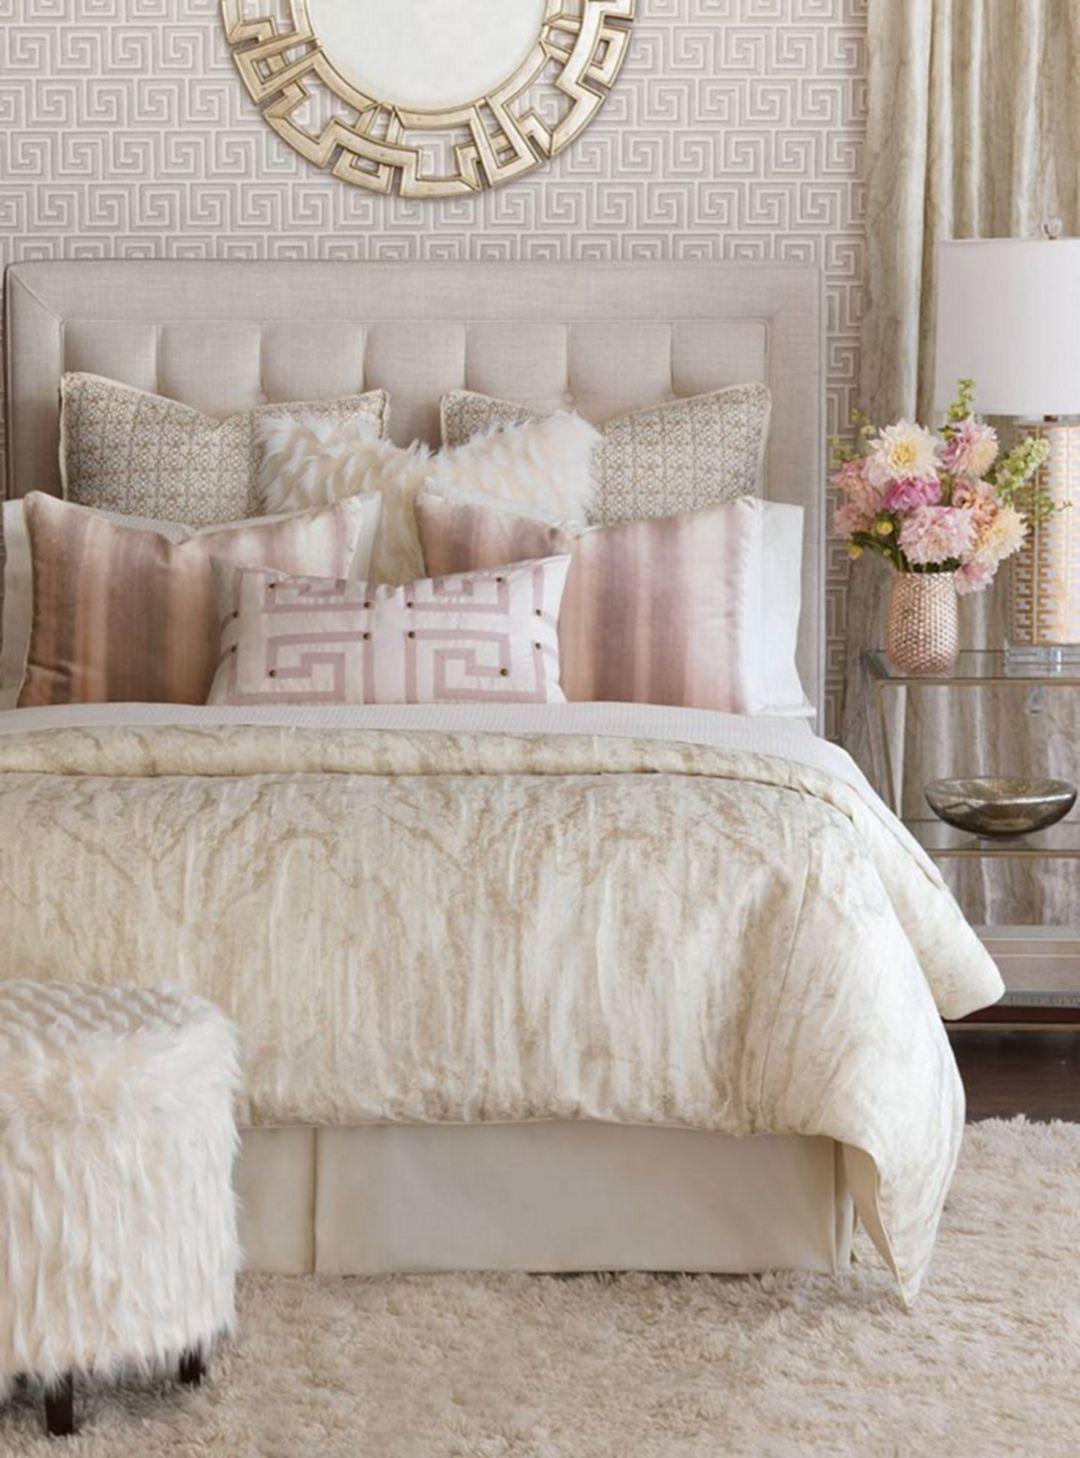 Modern Romantic Bedroom Designs: Romantic Master Bedroom Design Ideas 1025 (With Images